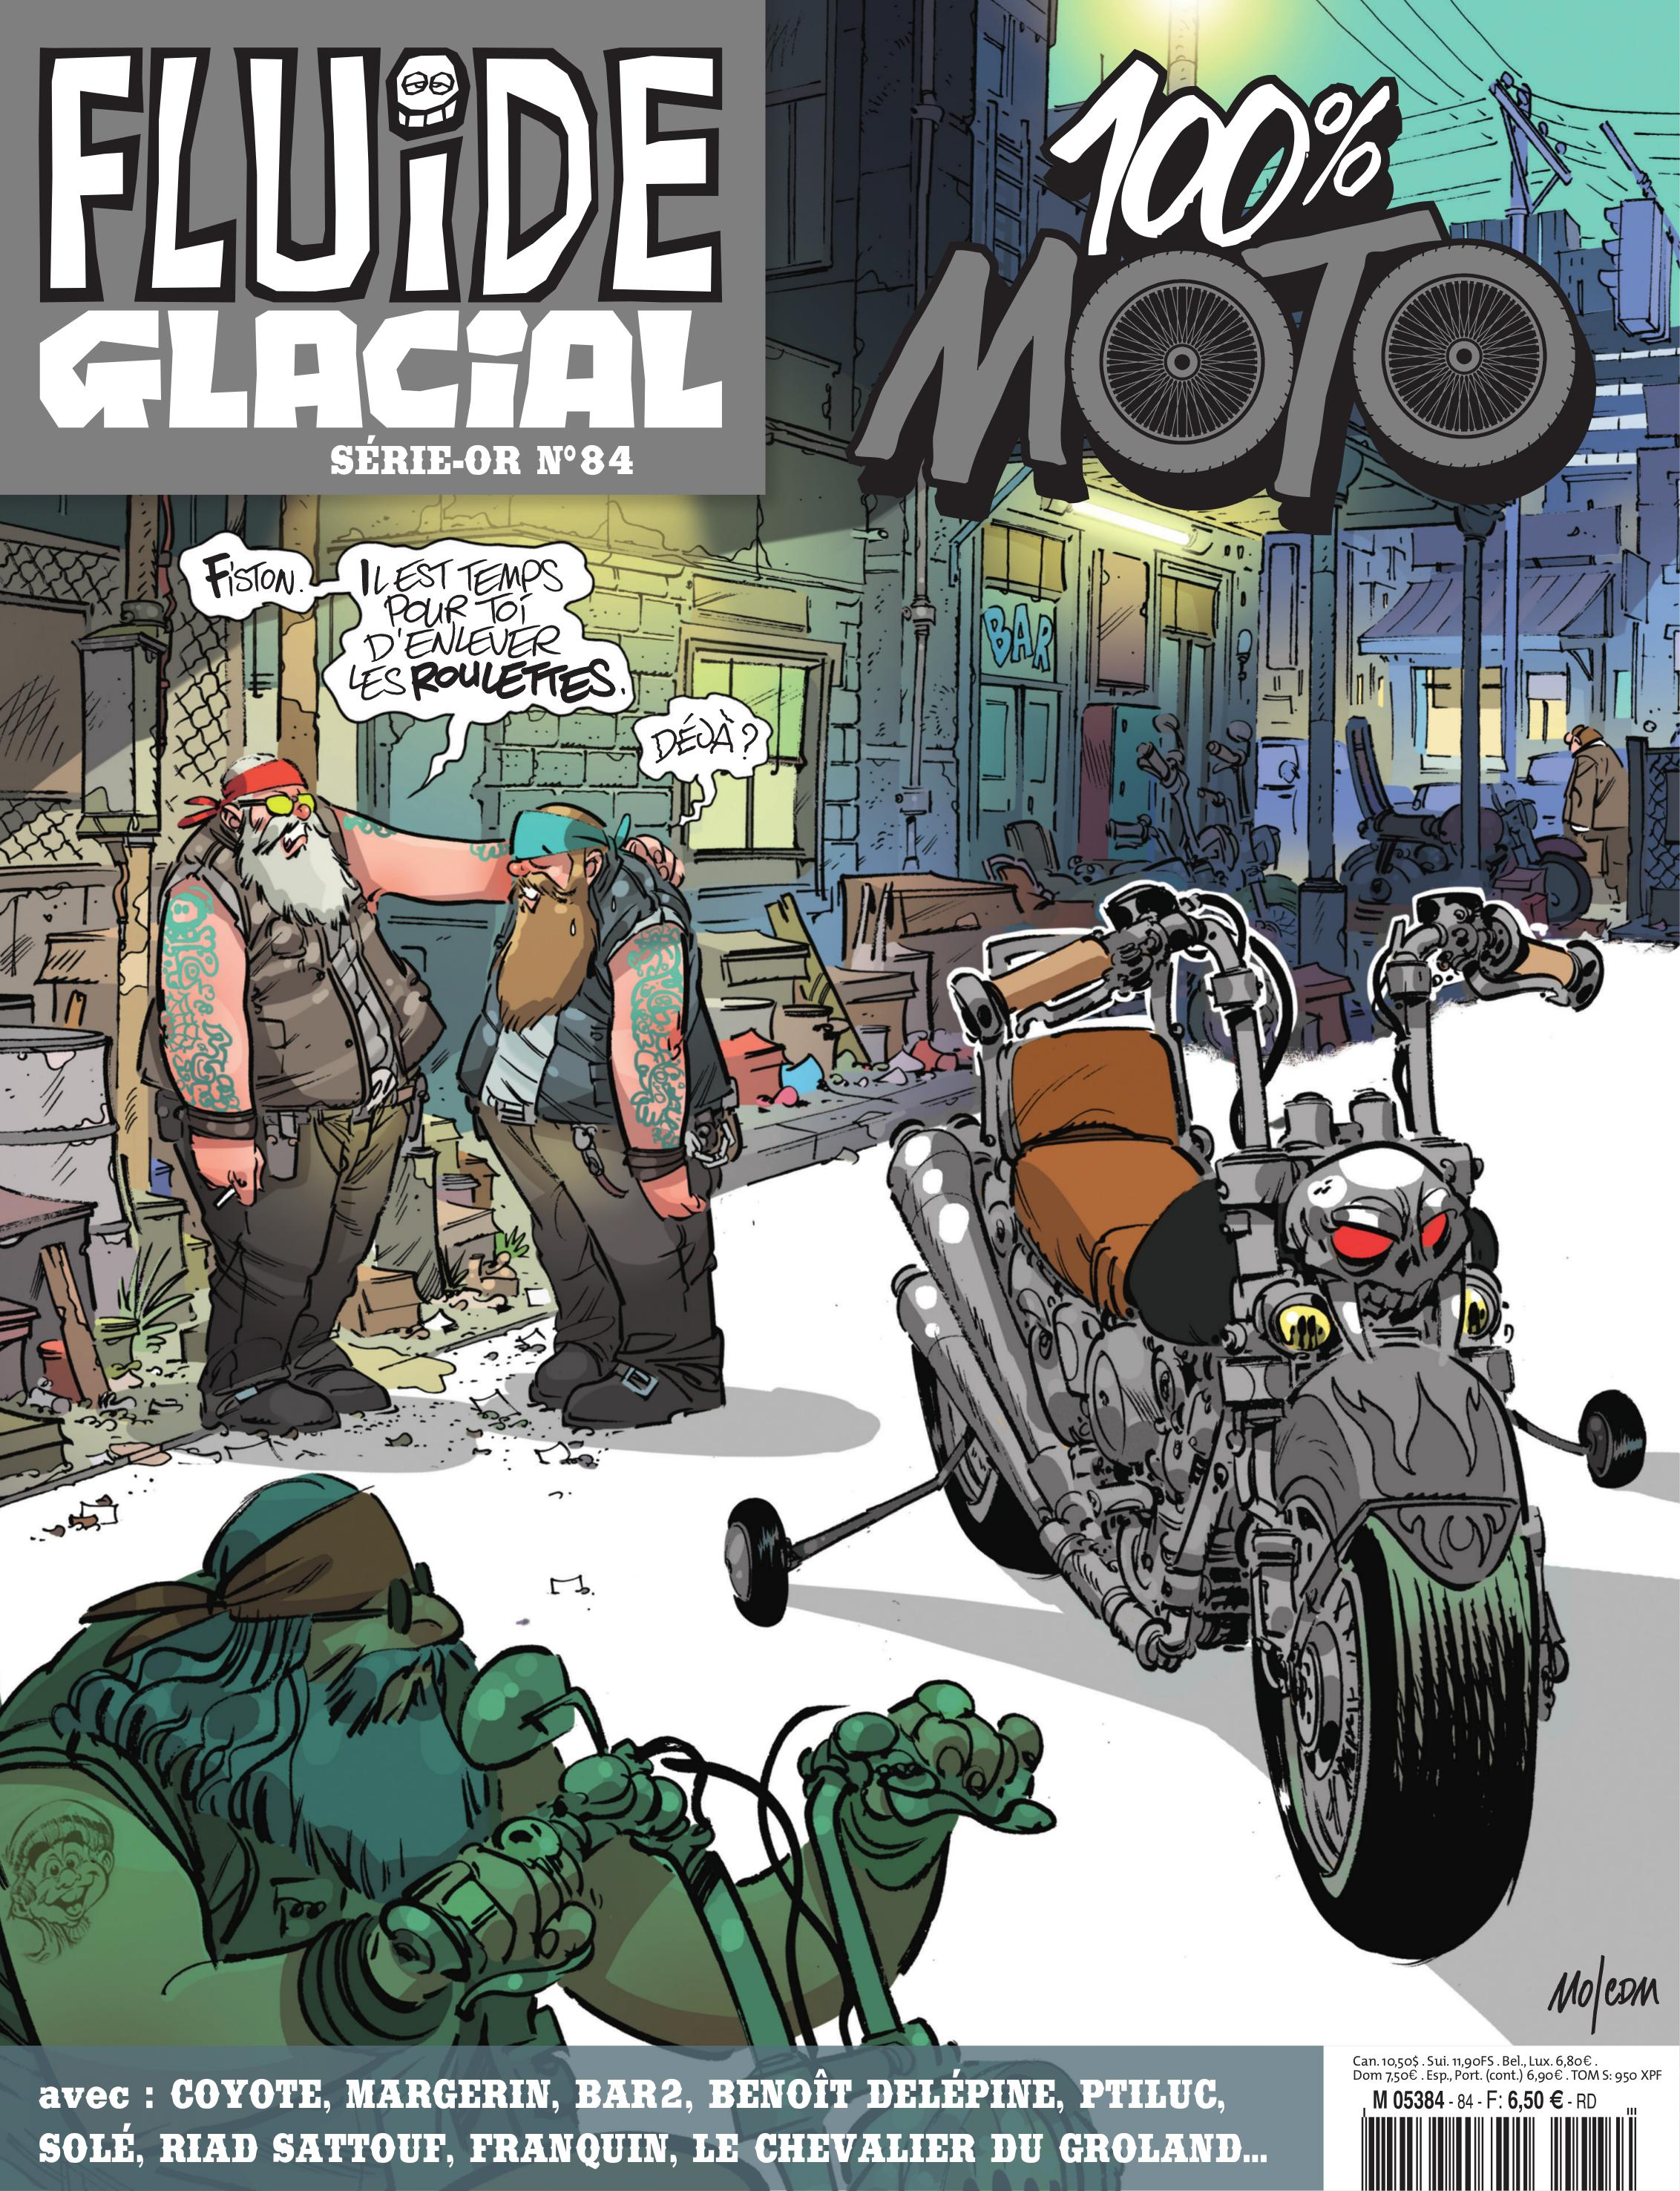 Fluide Glacial 100% Moto, plein gaz